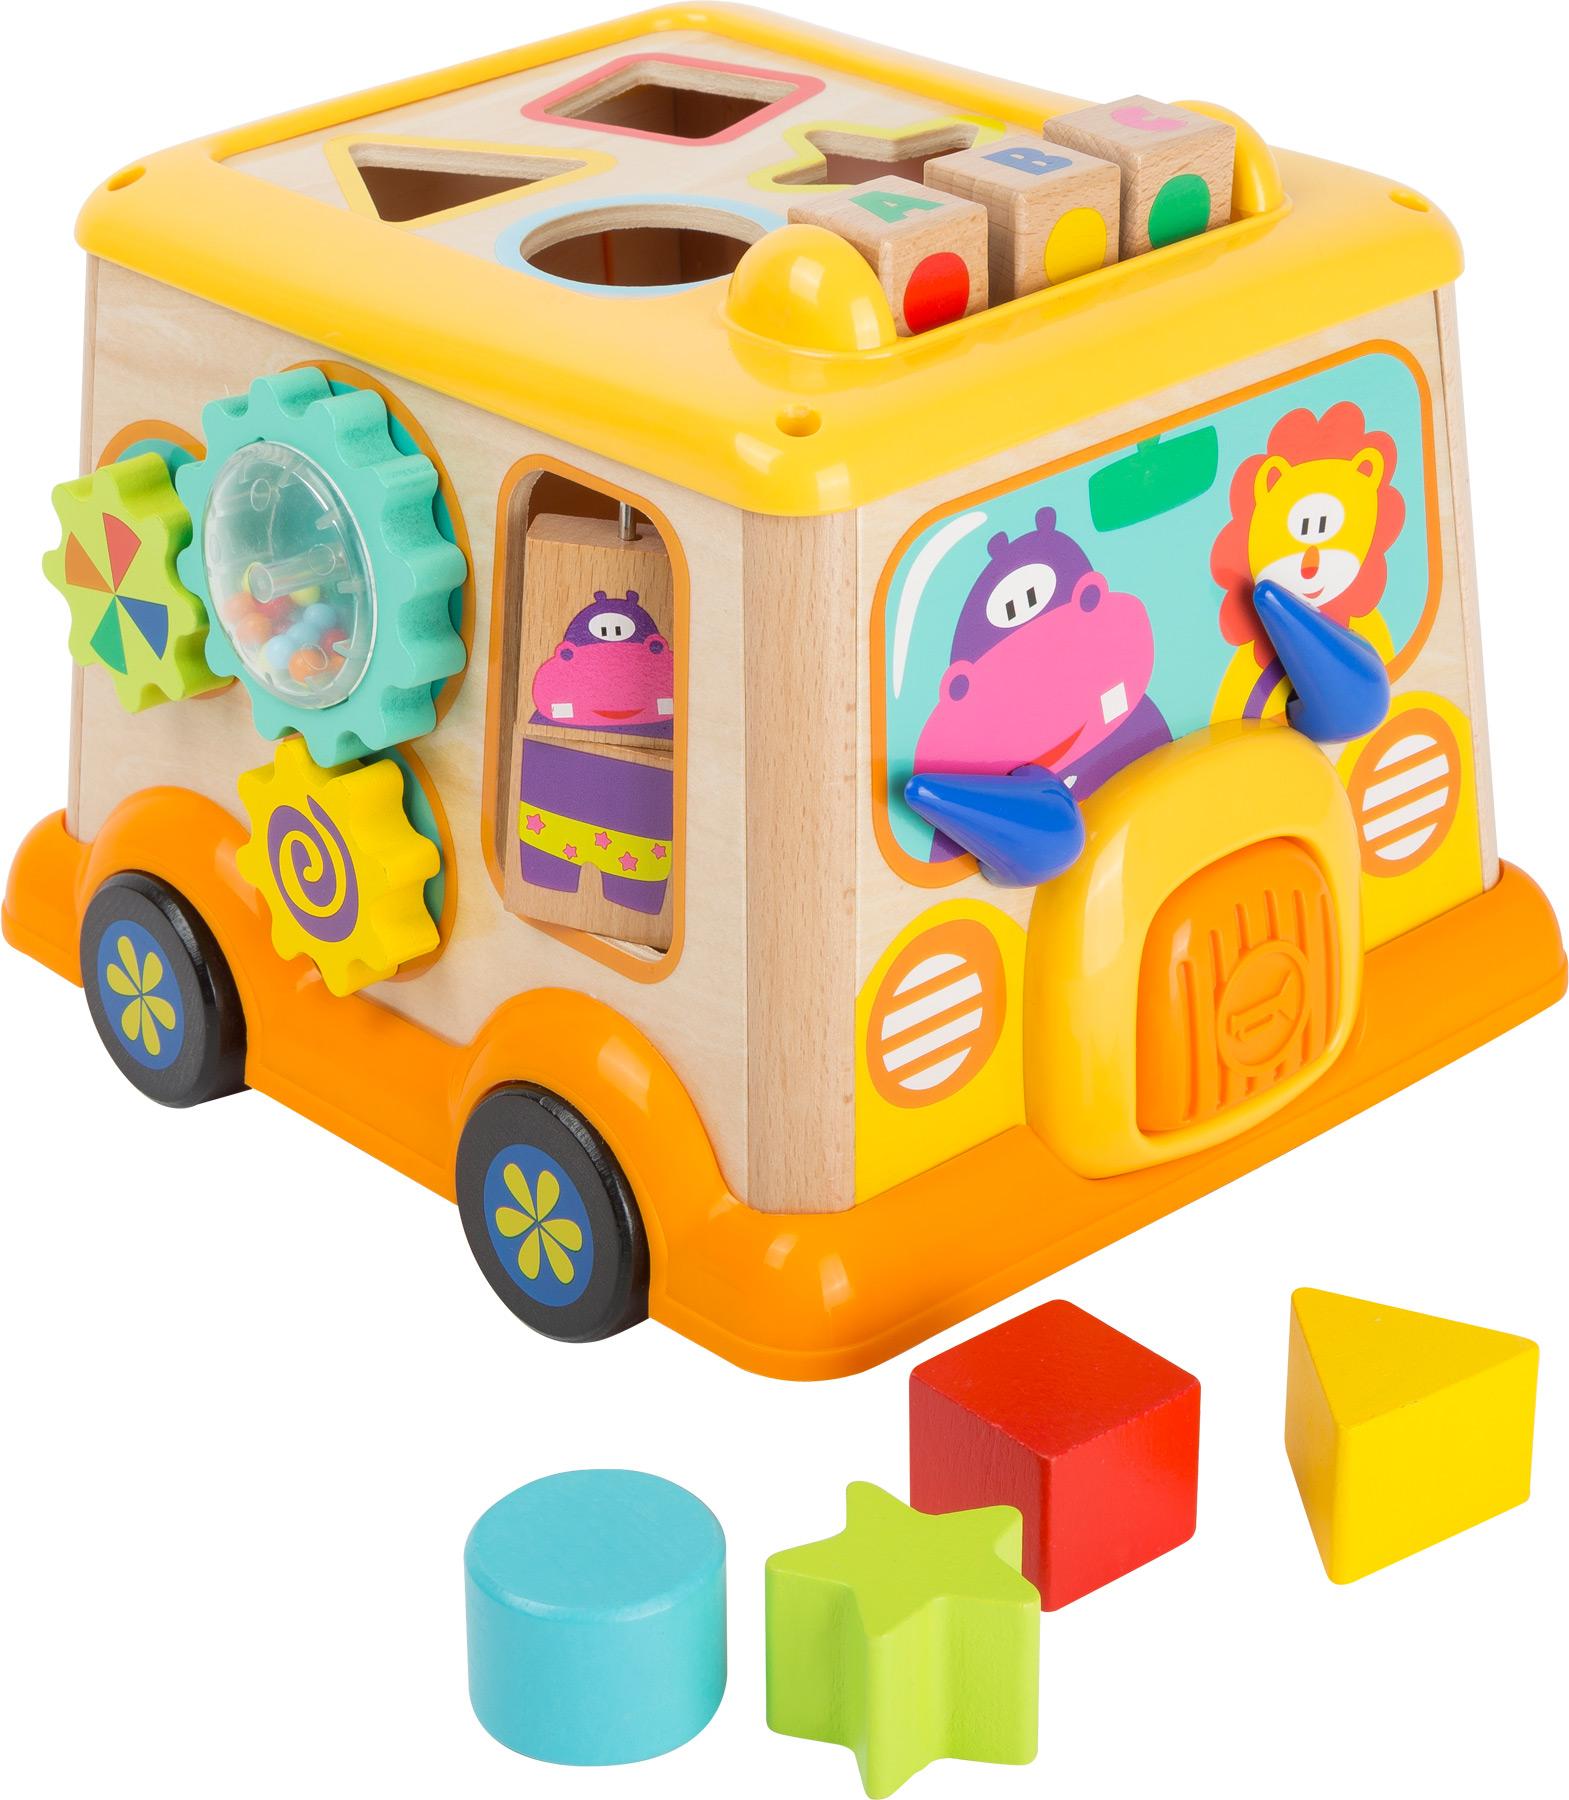 School Bus Motor Skills Toy